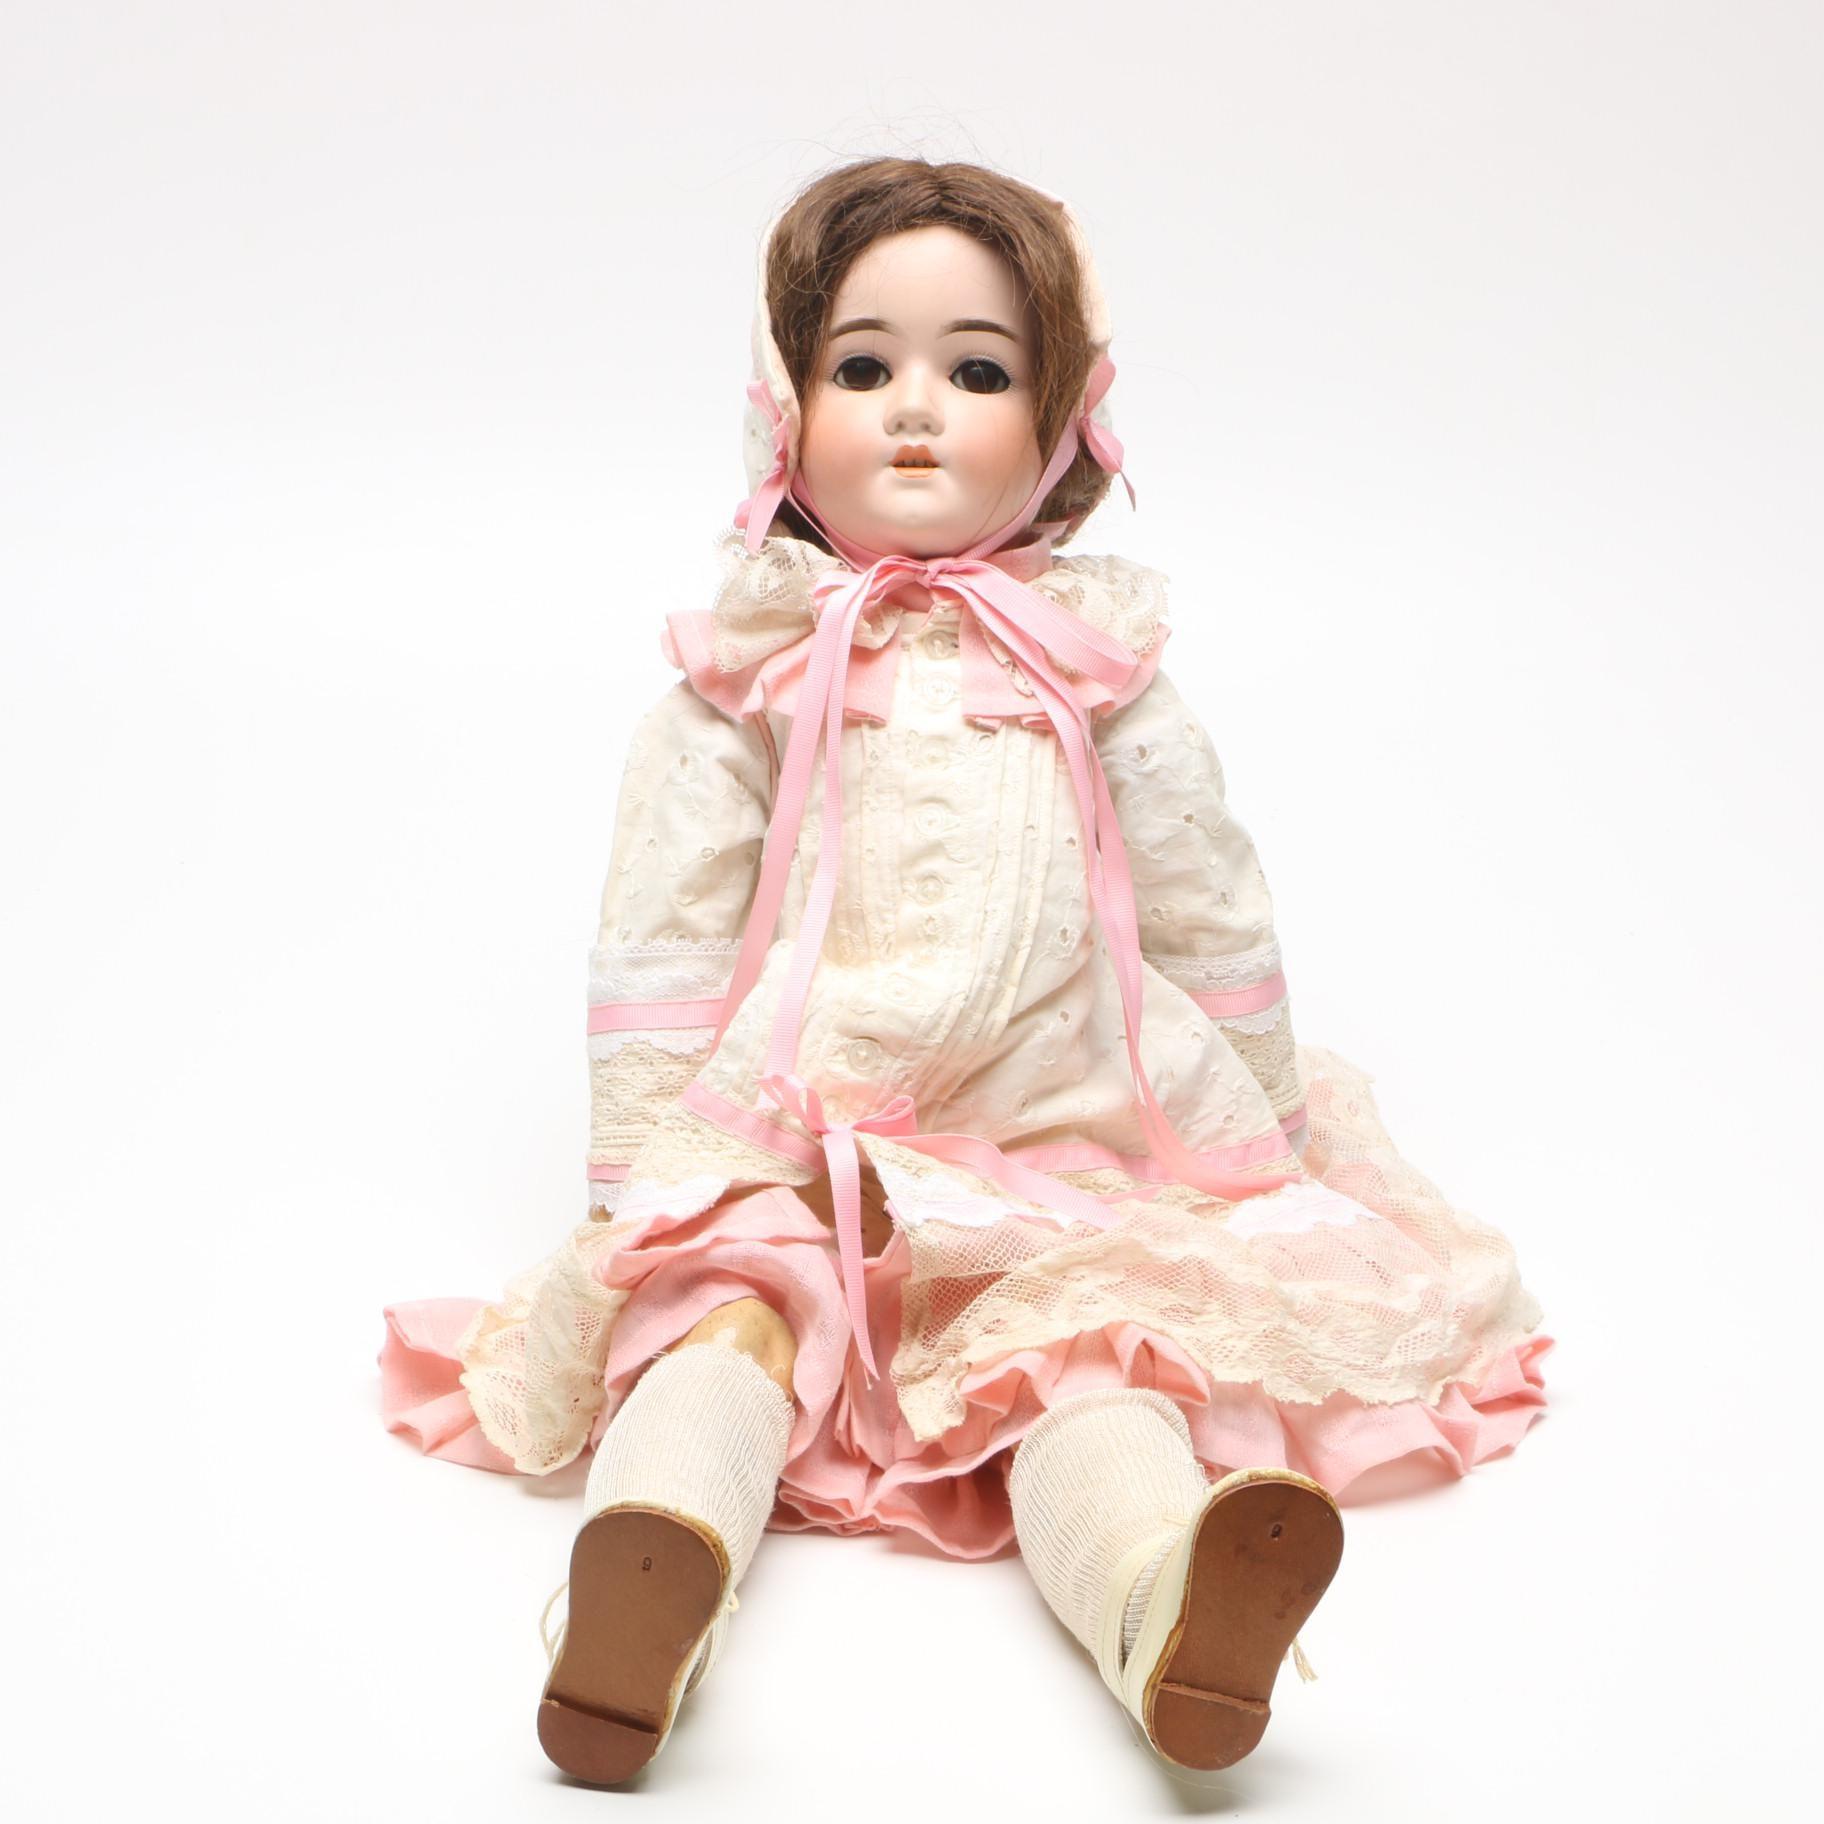 Antique German Female Doll